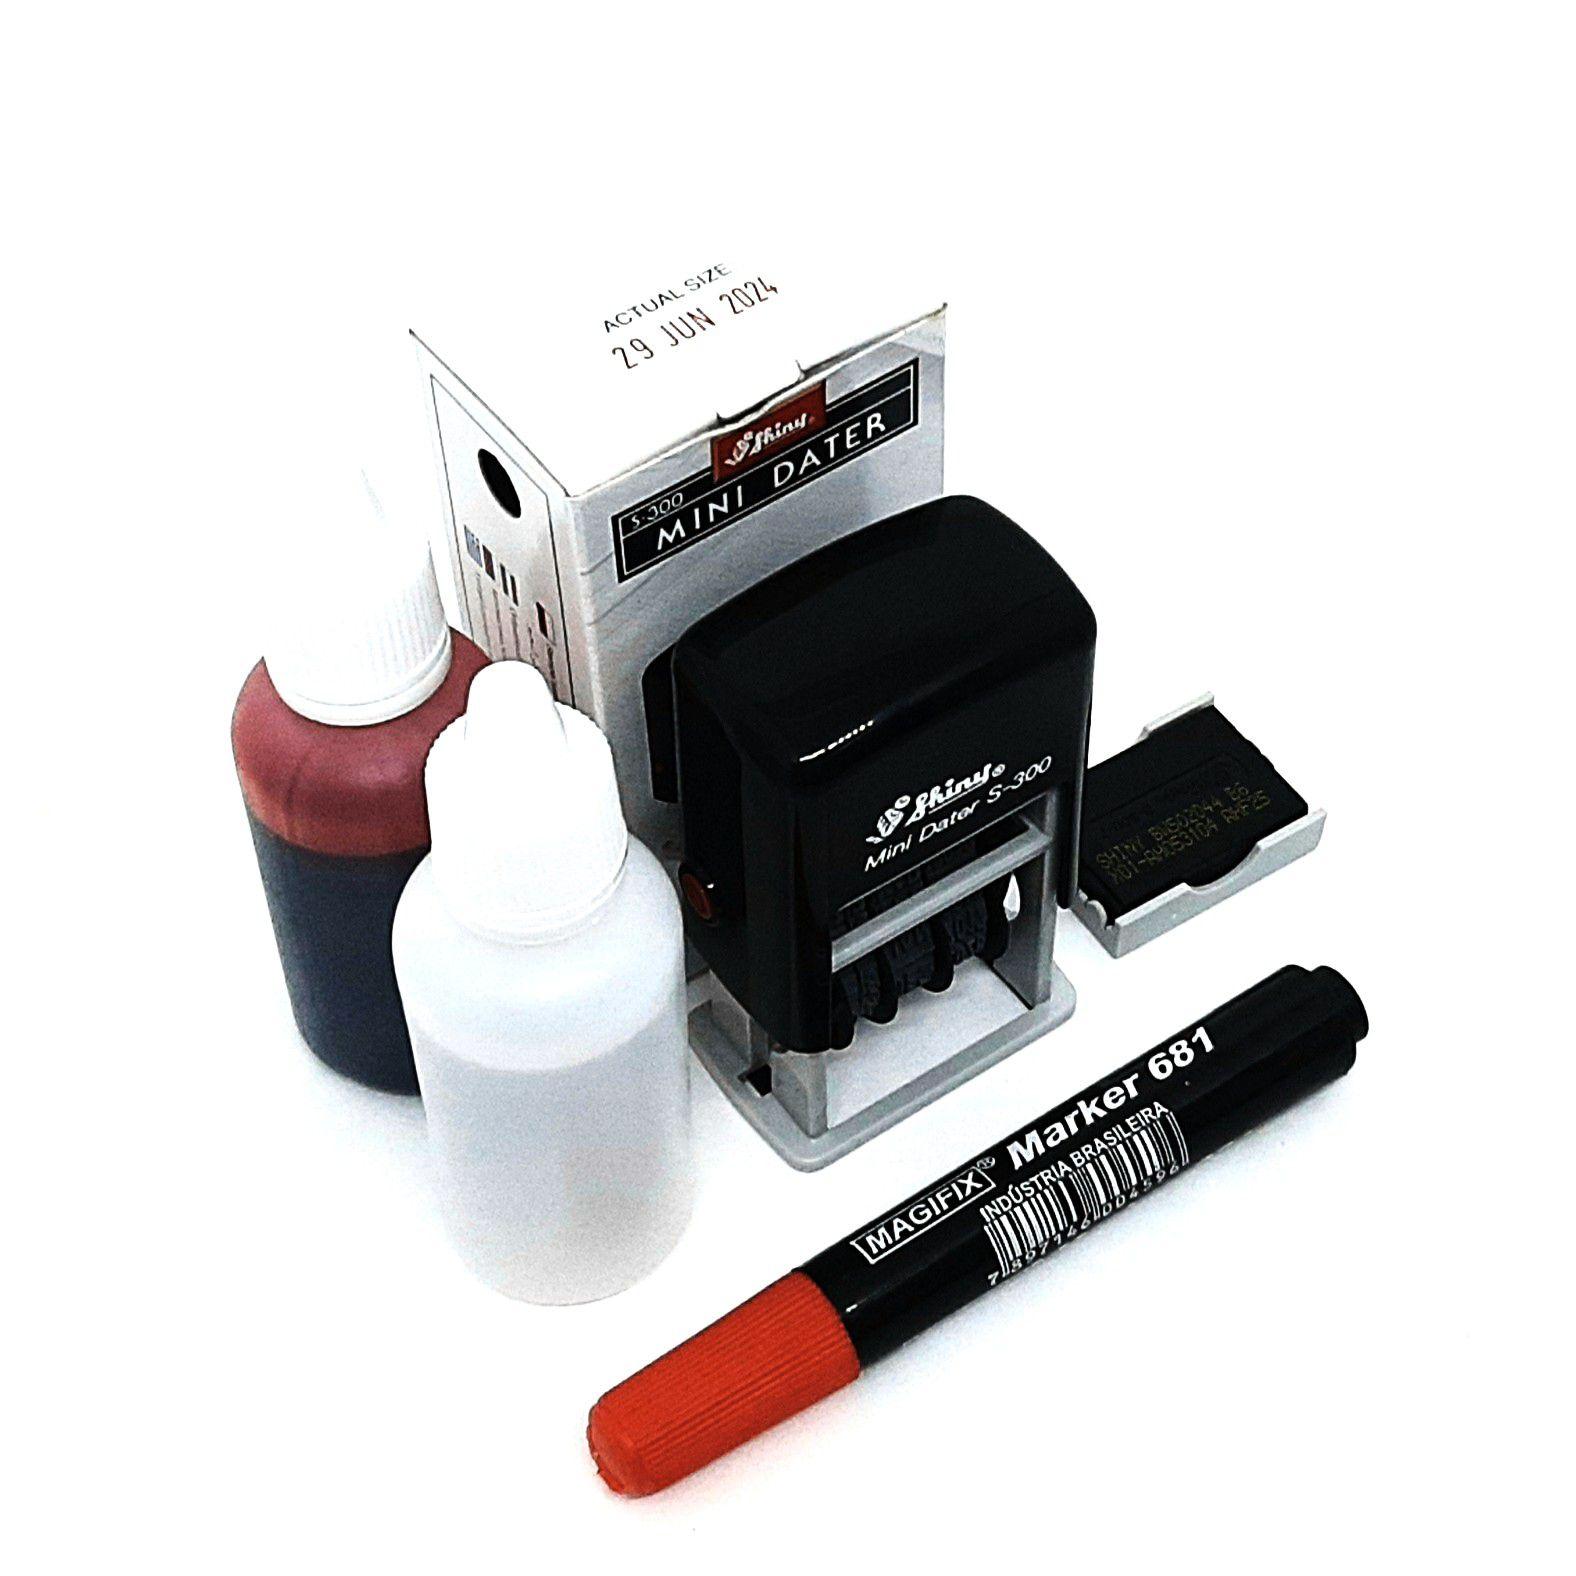 Kit Carimbo Datador Automático - Carimbo+Refil+Caneta+Tinta+Reativador.